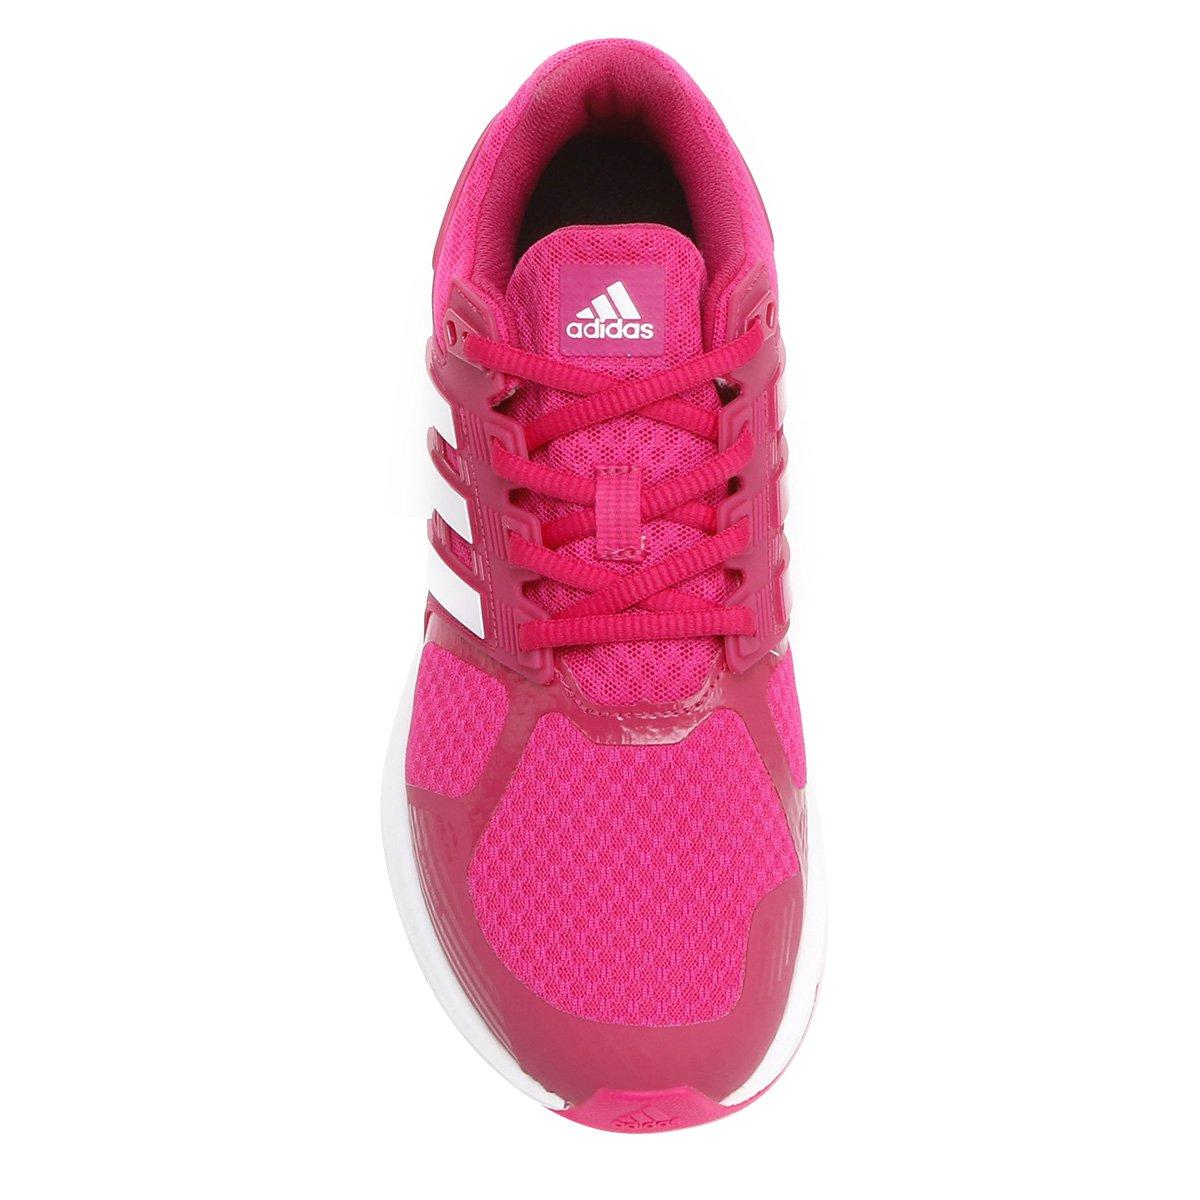 ... Tênis Adidas Duramo 8 Feminino - Pink e Branco - Compre Agora Netshoes  a7d587abe0eddf . ... cf0723ef92ac6